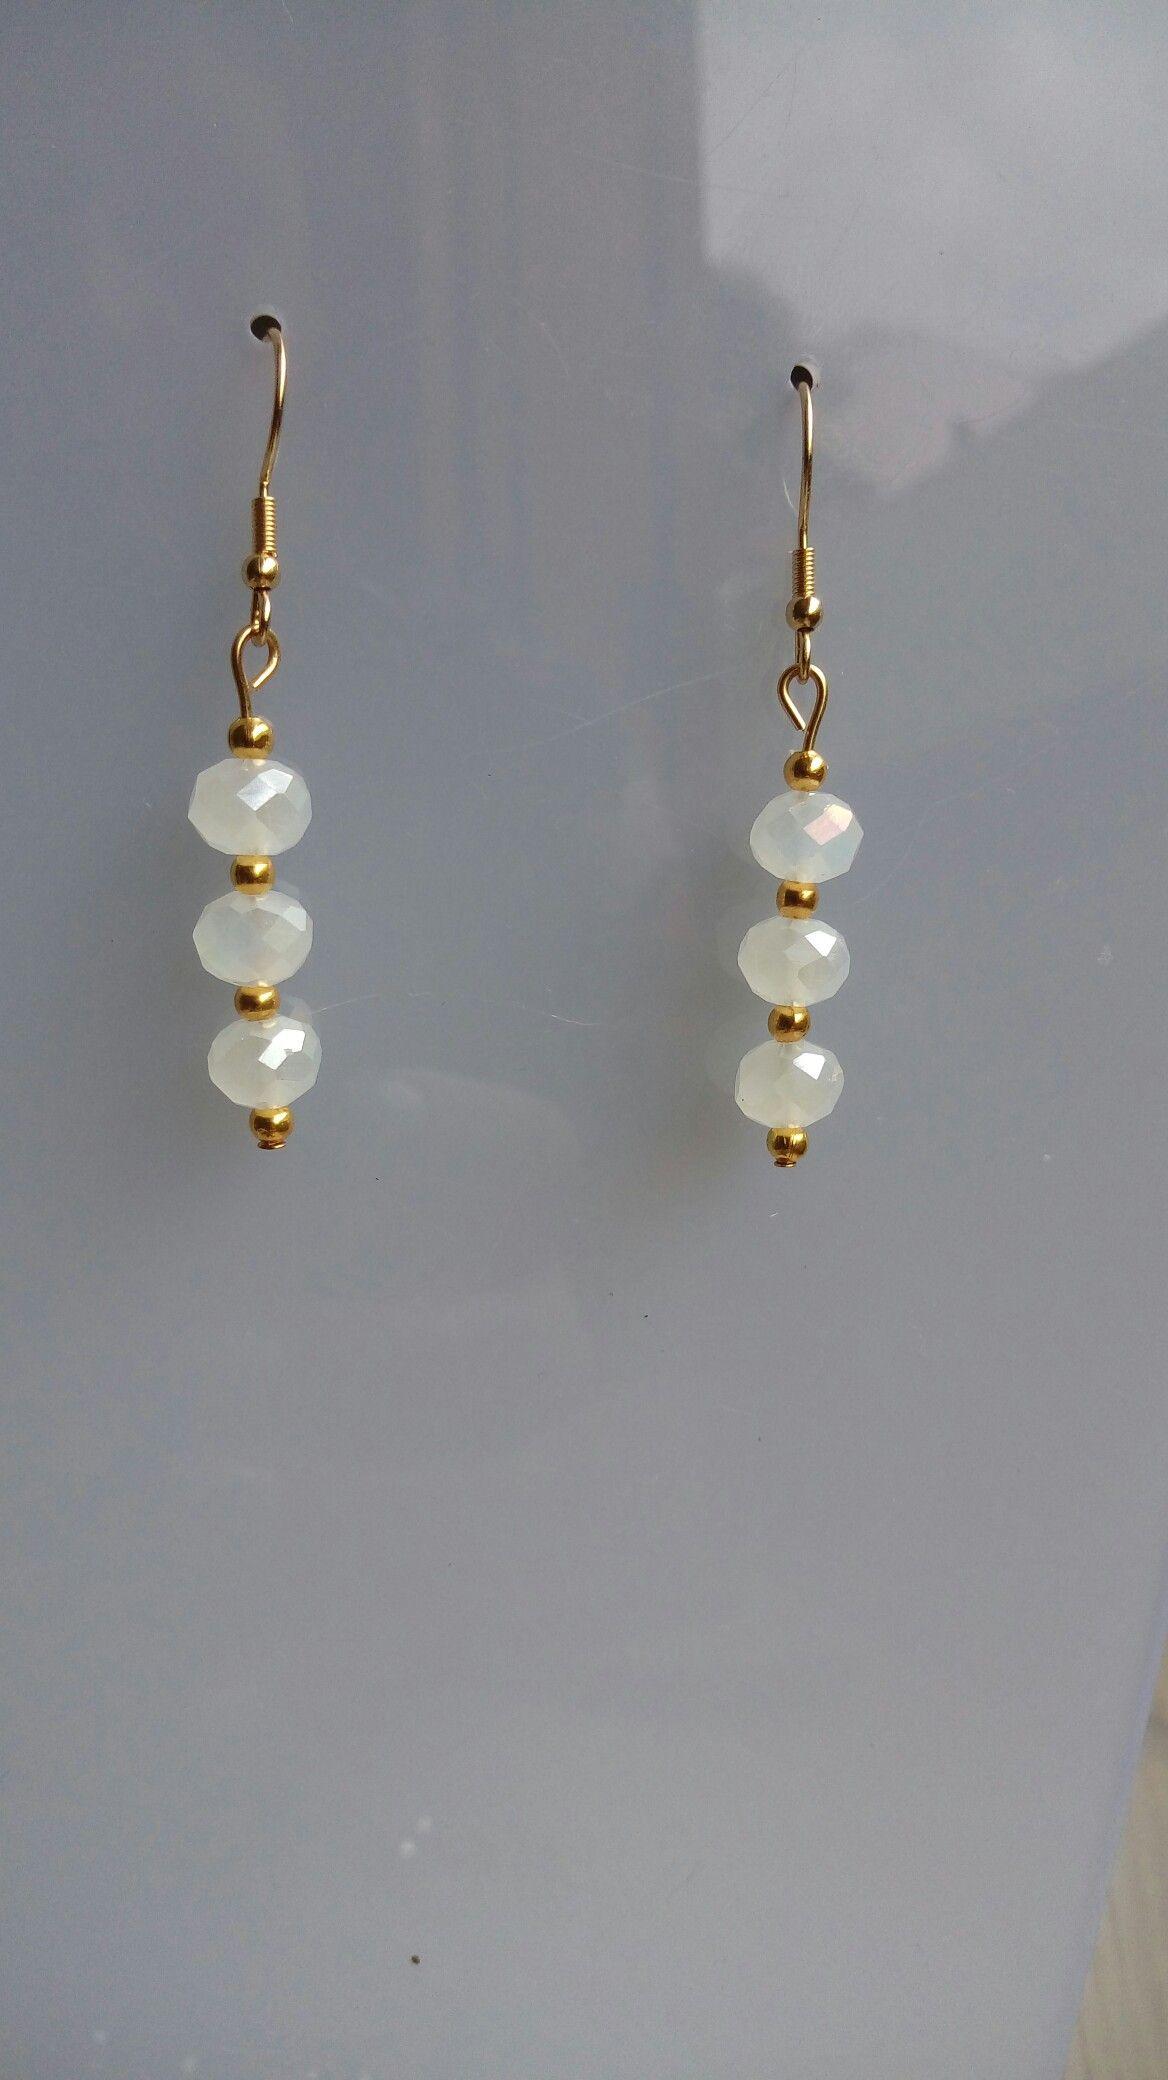 Wire Wrapped Earrings, Craft Jewelry, Jewelry Making, Jewelry Ideas, Beading